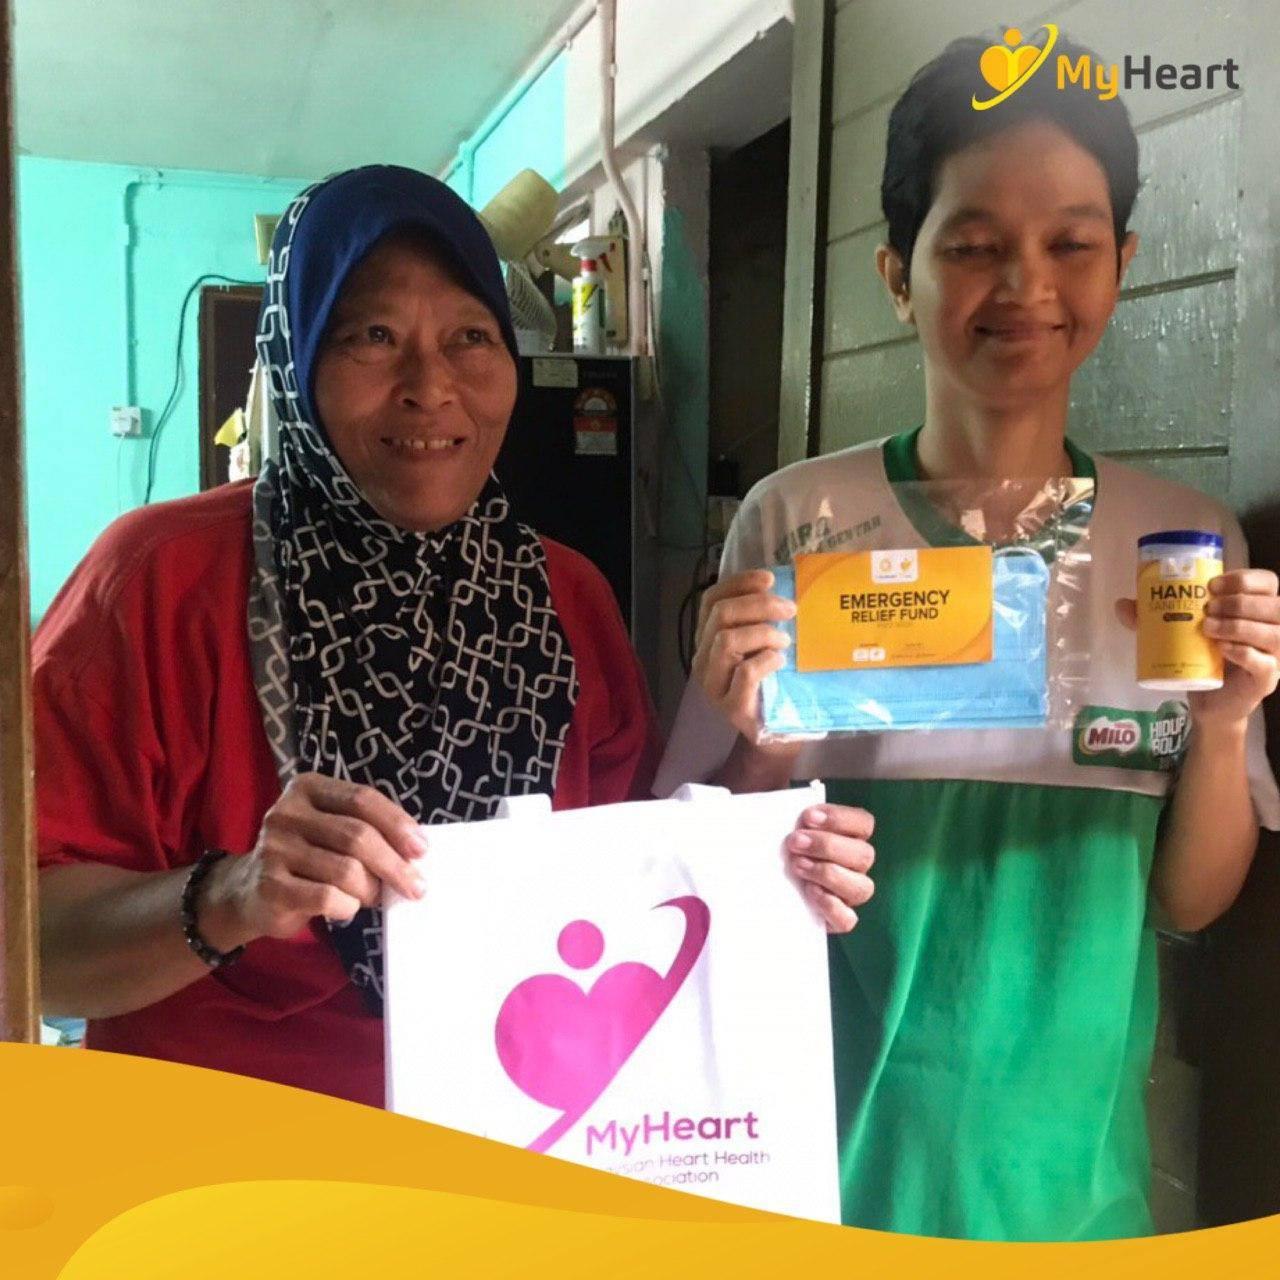 Face Mask Dan Hand Sanitiser Ke 10 Buah Rumah Asnaf Di Sekitar Kuala Lumpur.